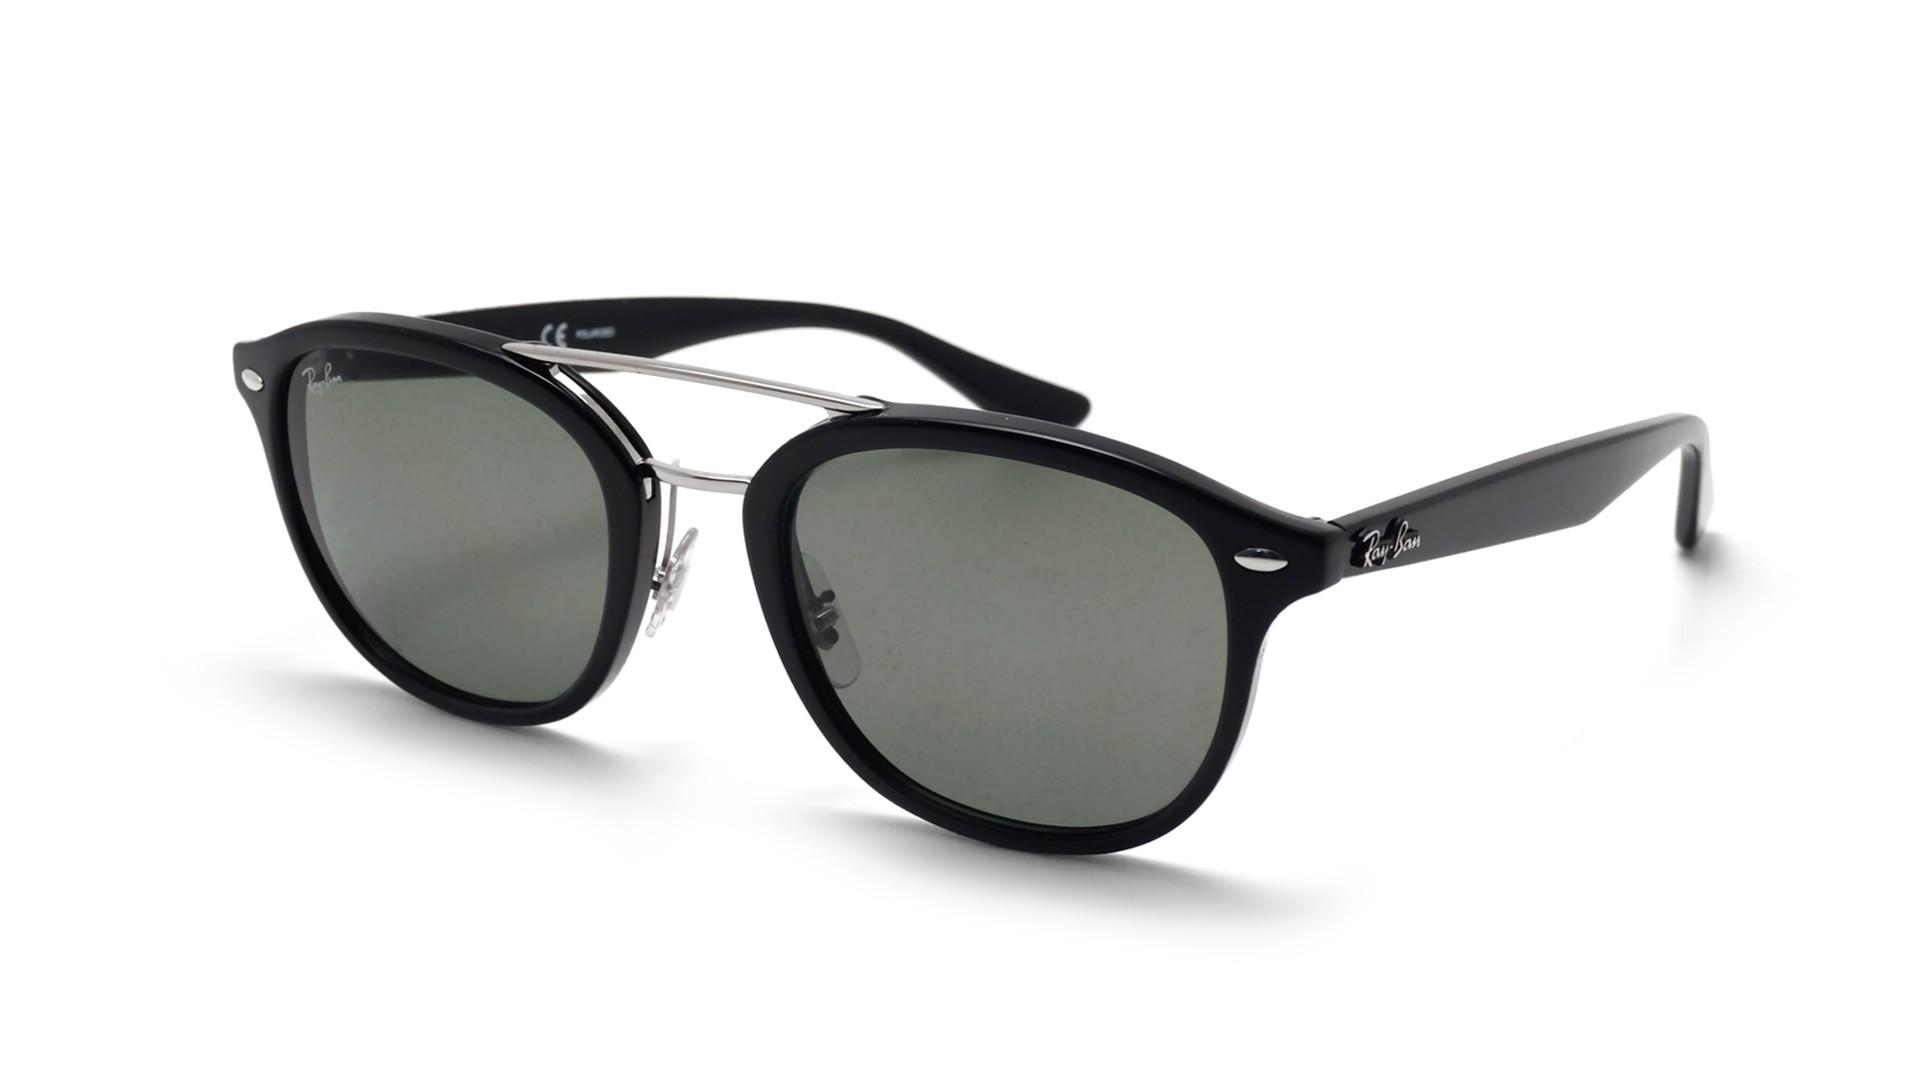 lunette ray ban homme noir